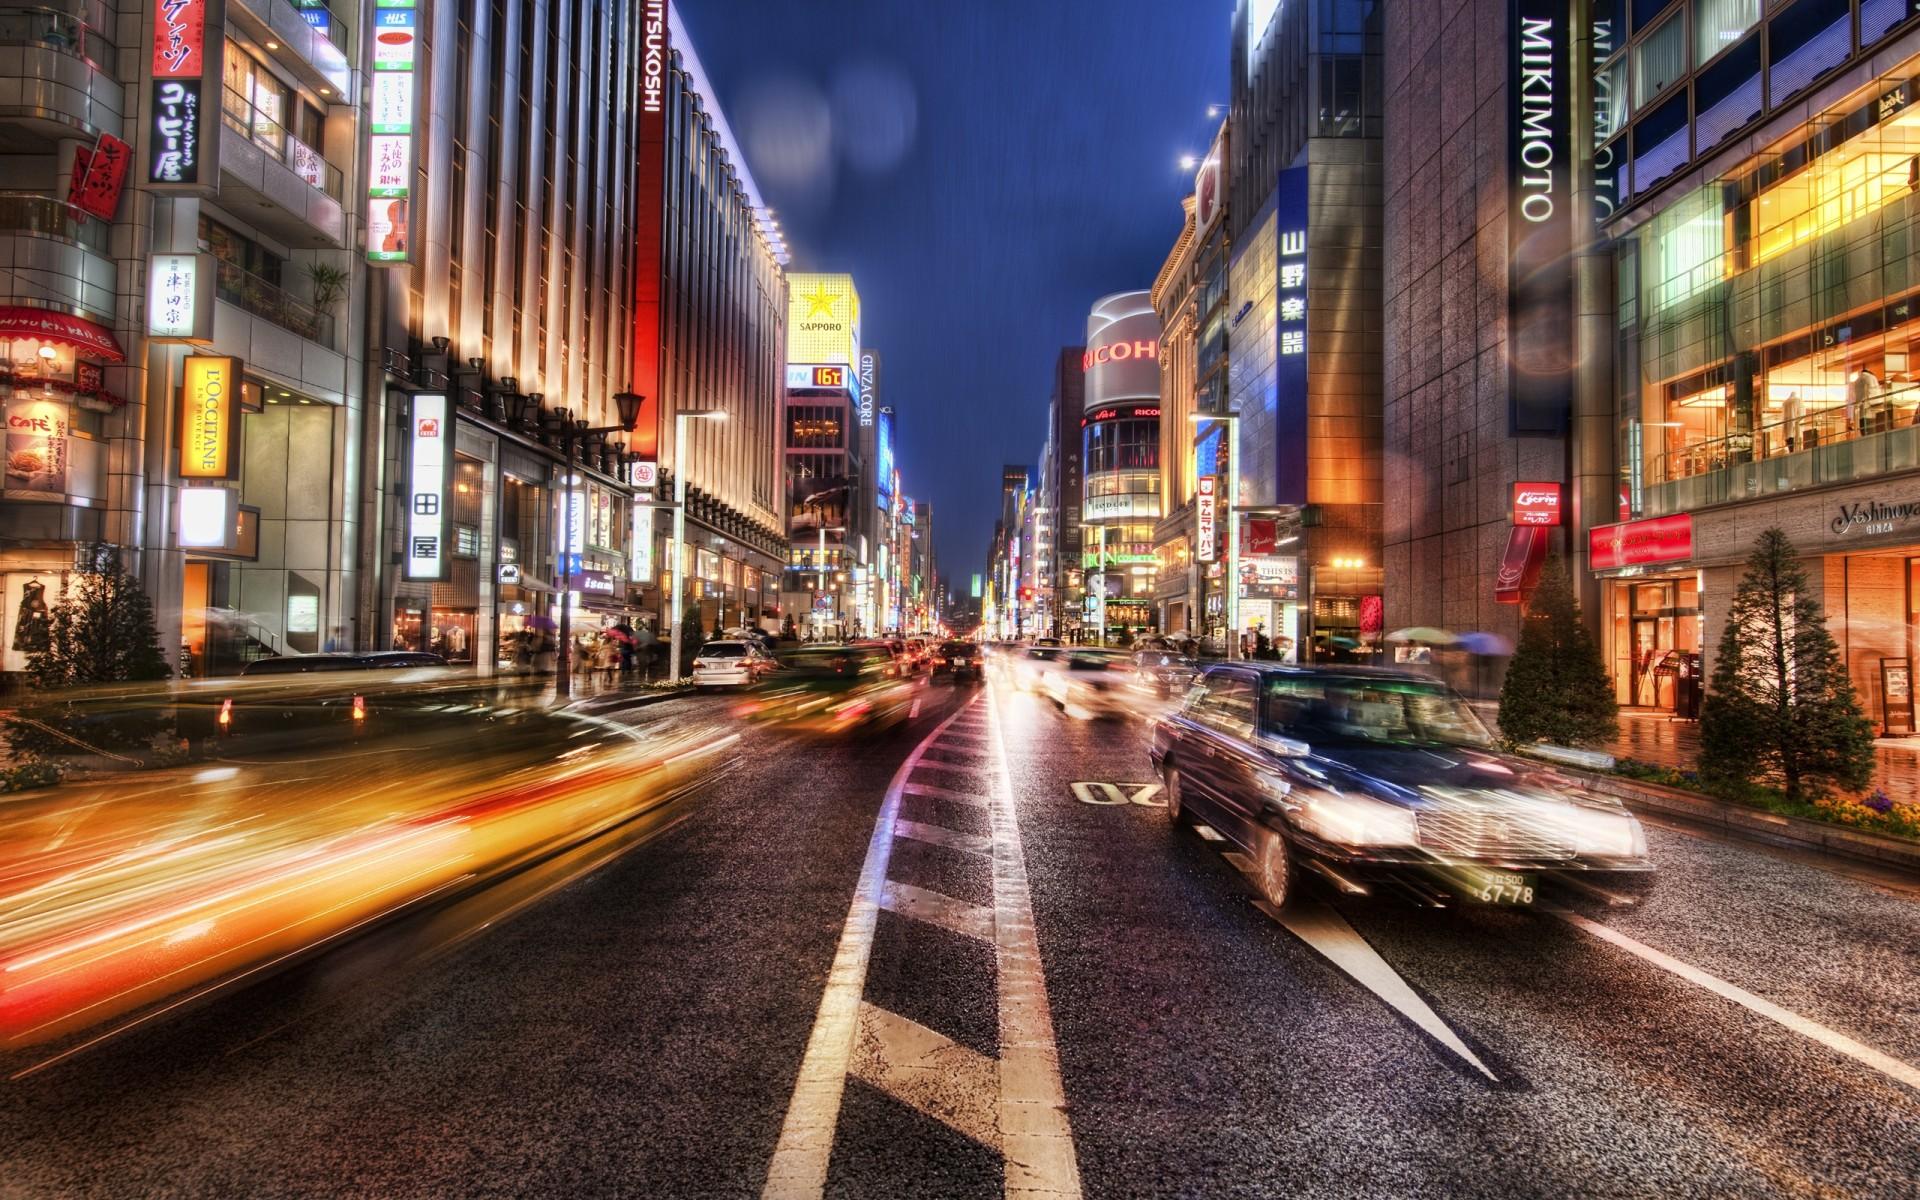 World_Japan_Night_street_Ginza_Japan_022608_.jpg